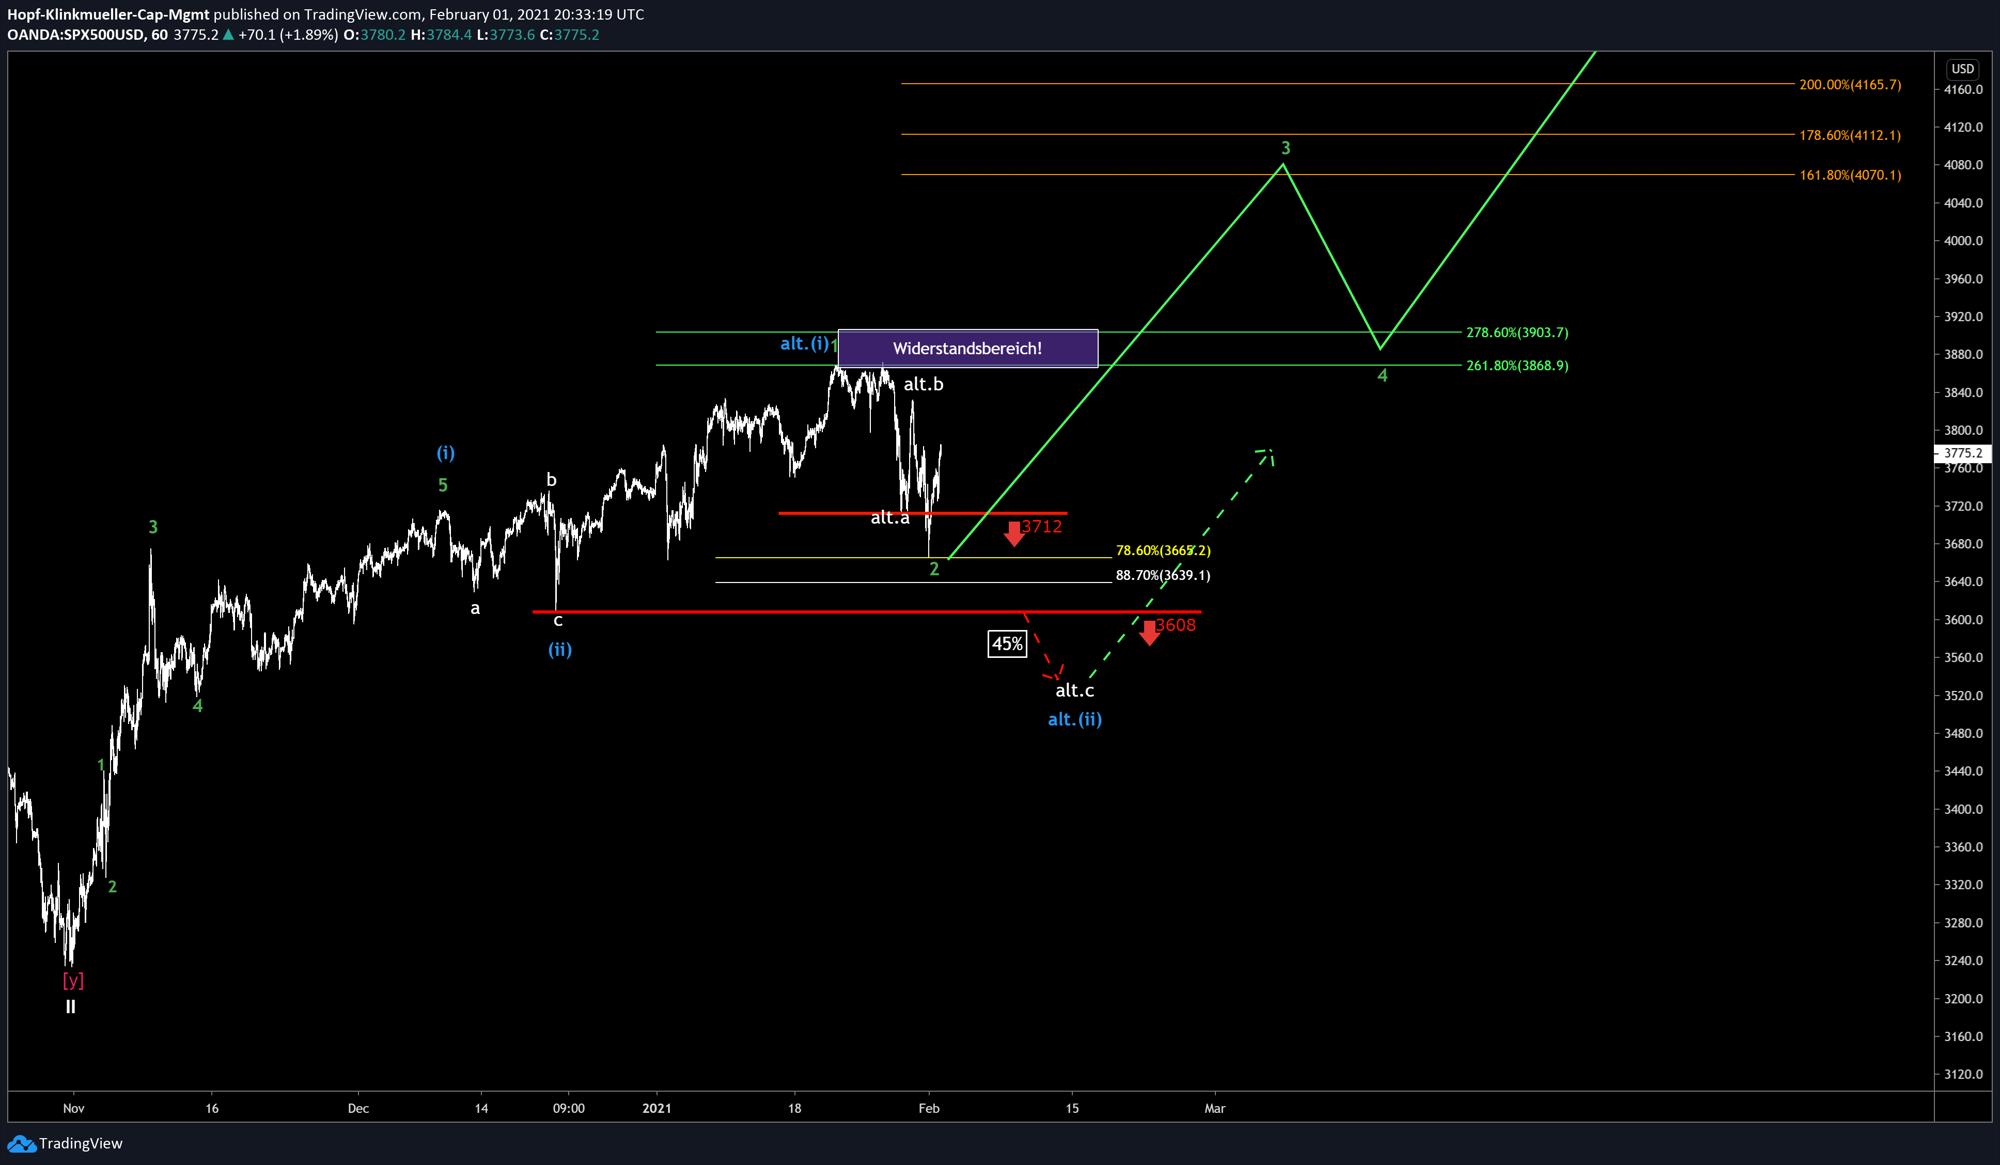 S&P500 Chart mit Szenarien